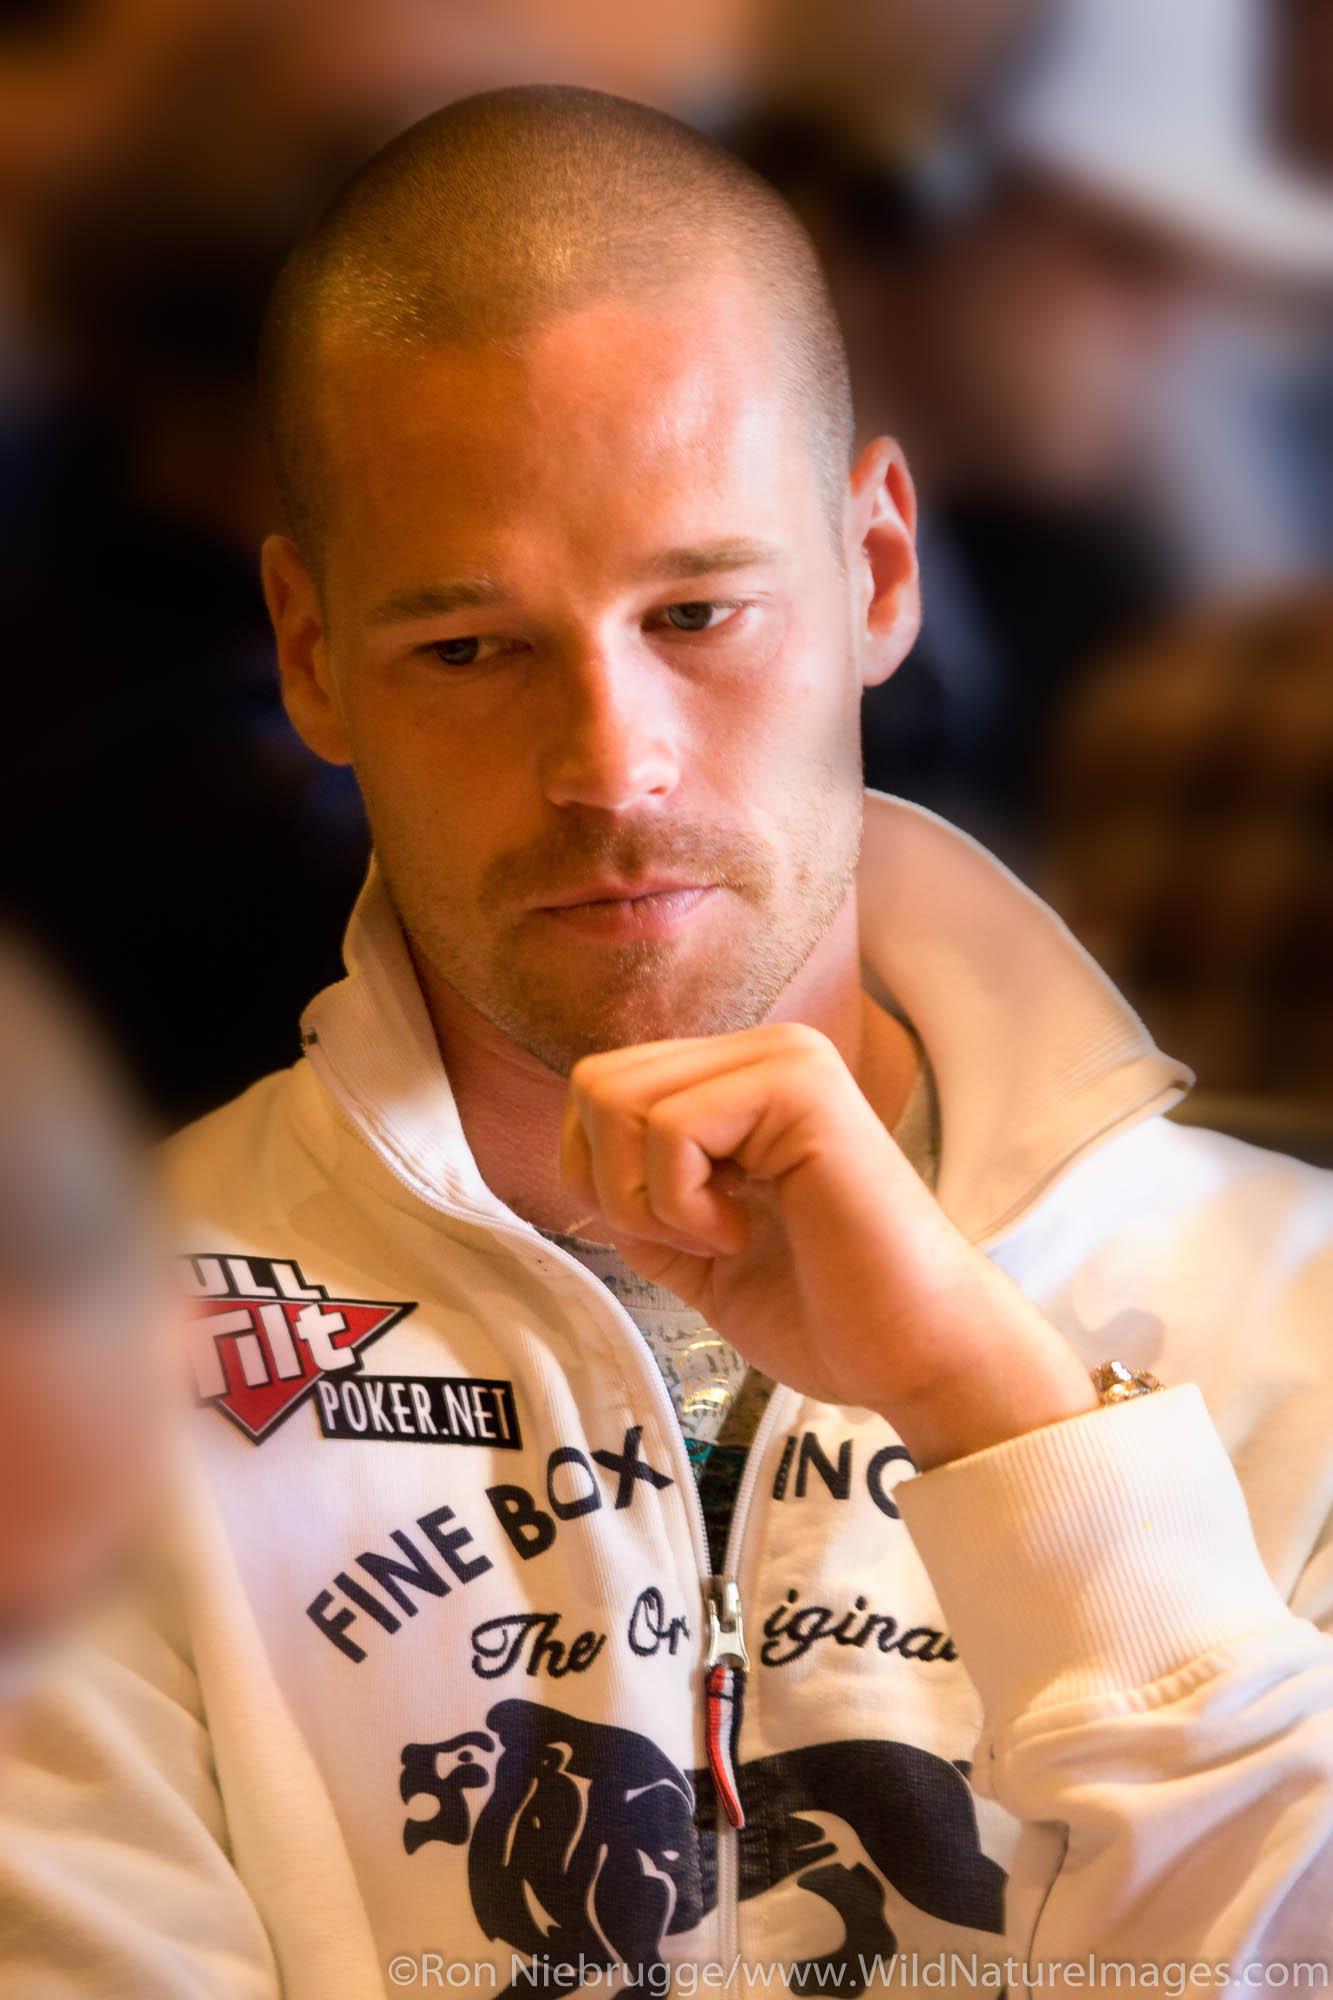 Patrik Antonius at the 2008 World Poker Tour Festa Al Lago poker tournament at the Bellagio Resort and Casino, Las Vegas, Nevada...